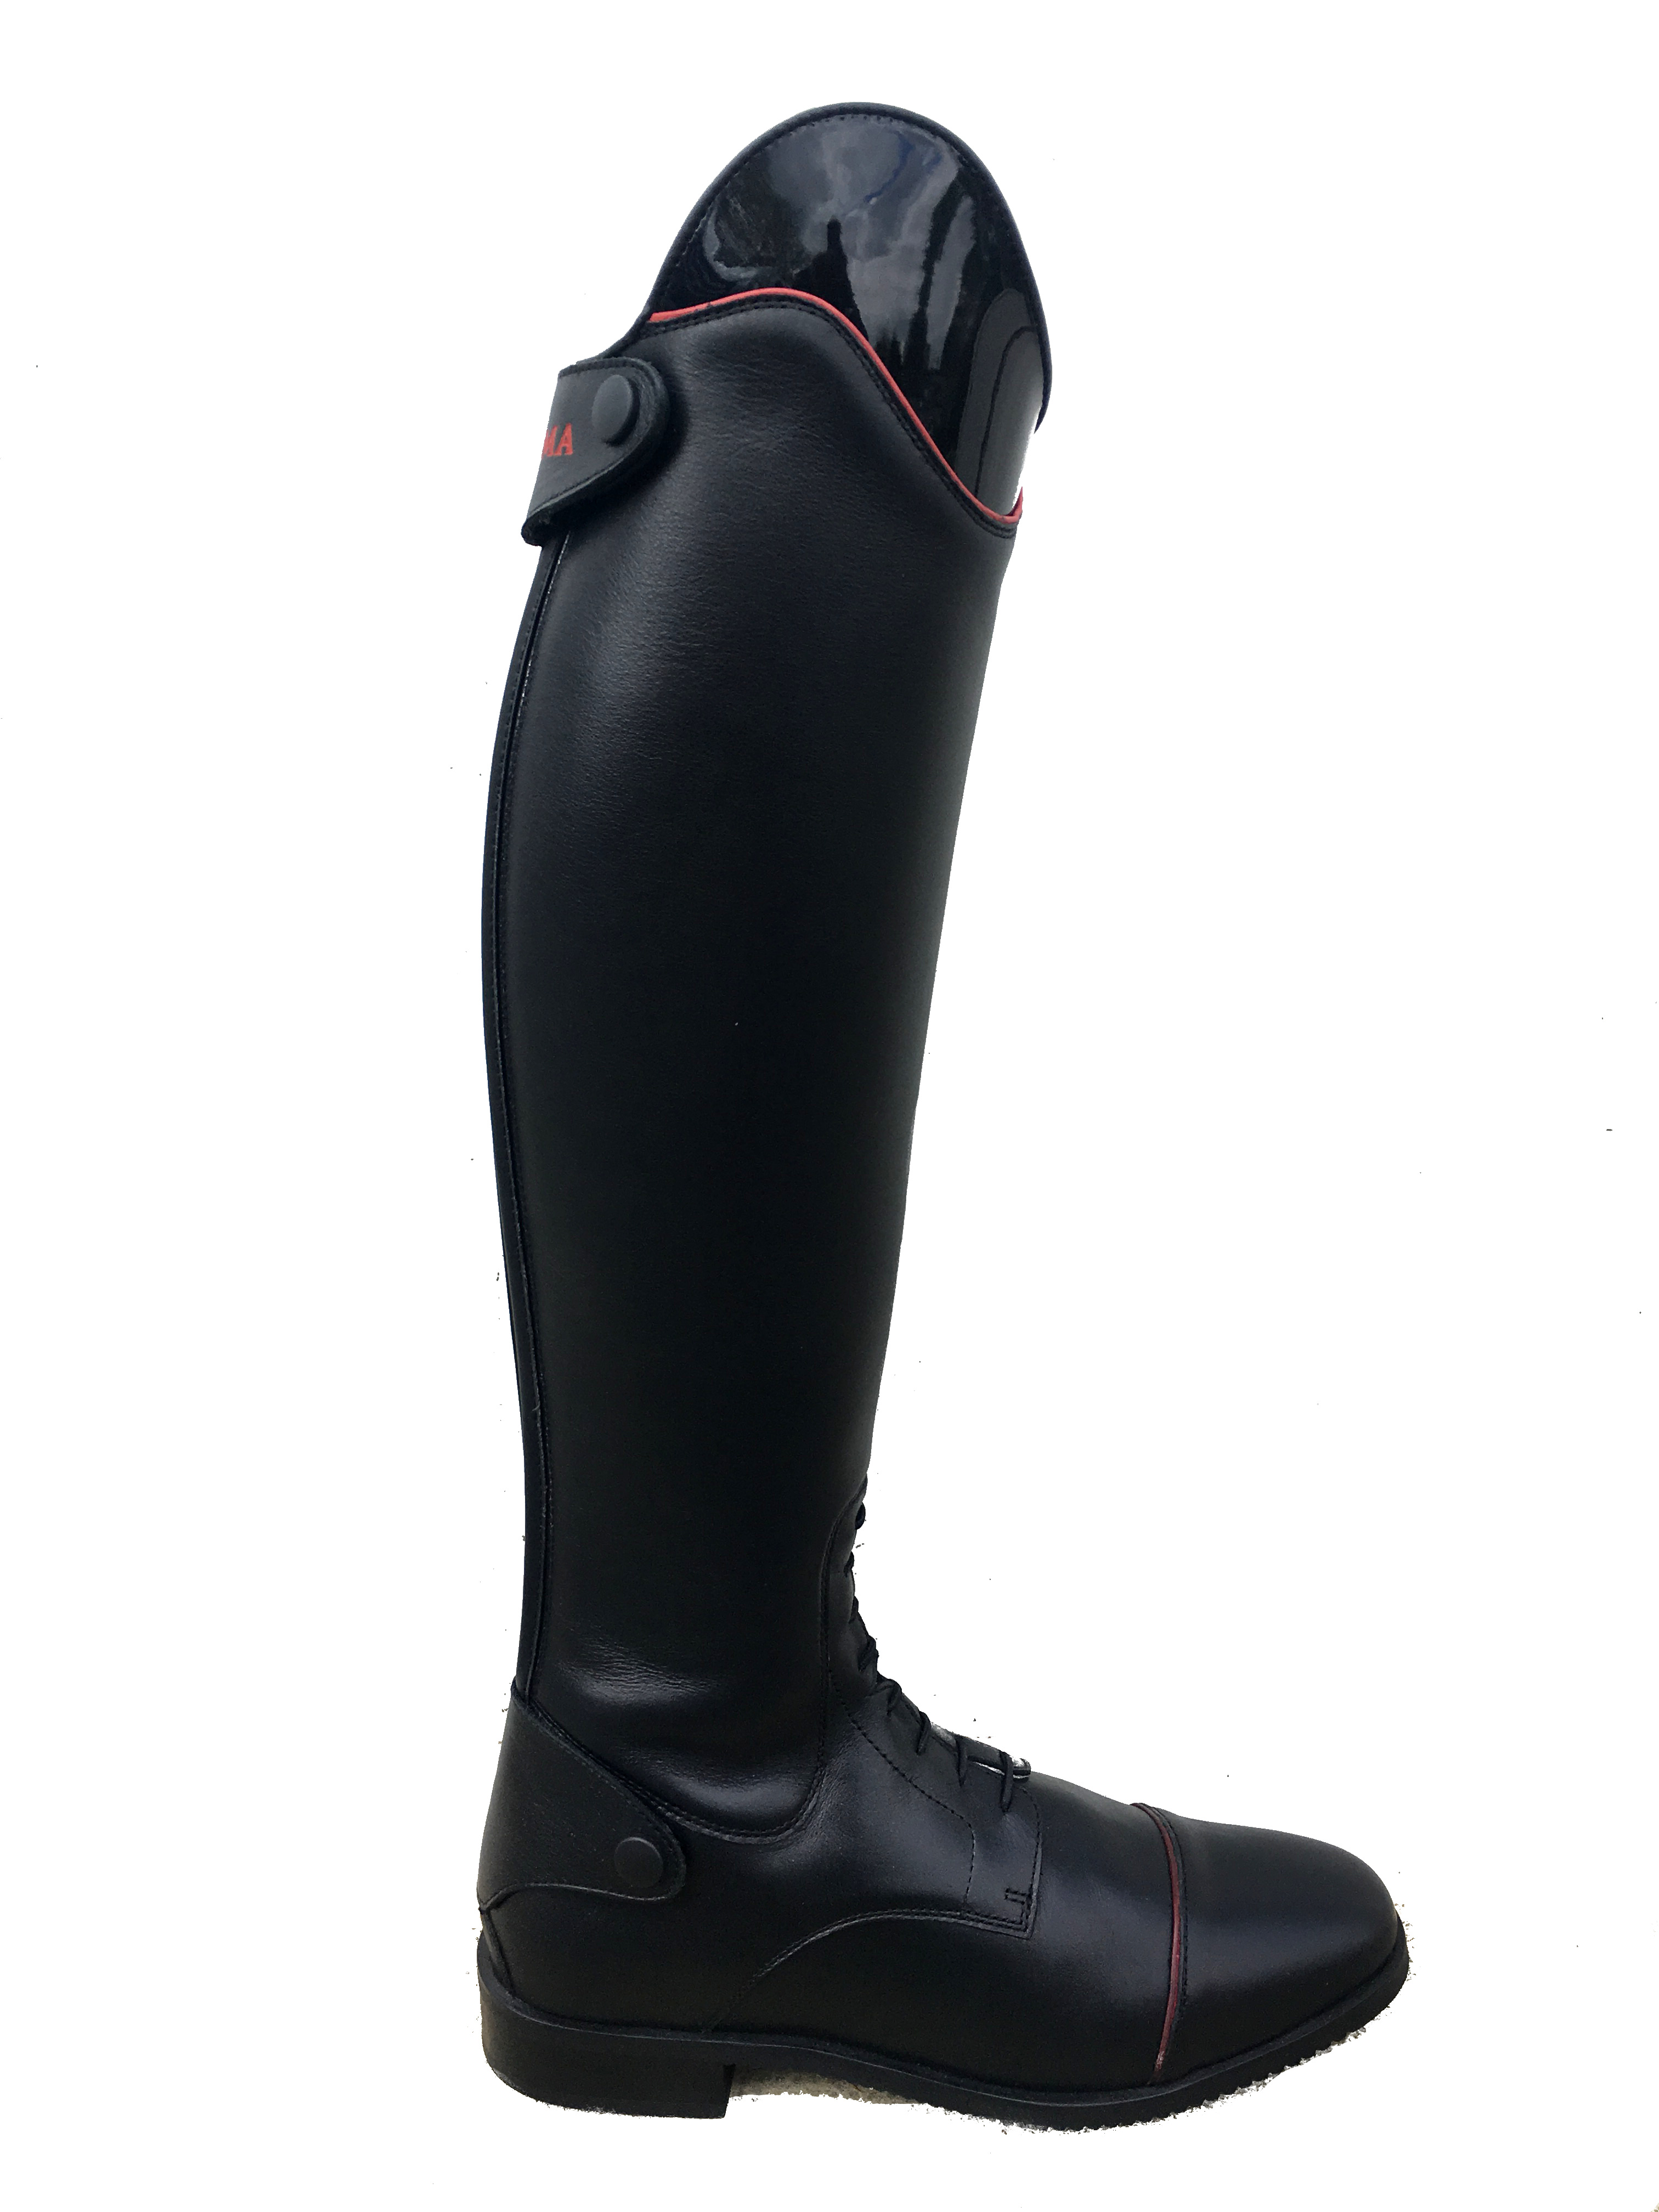 Axelle Boots